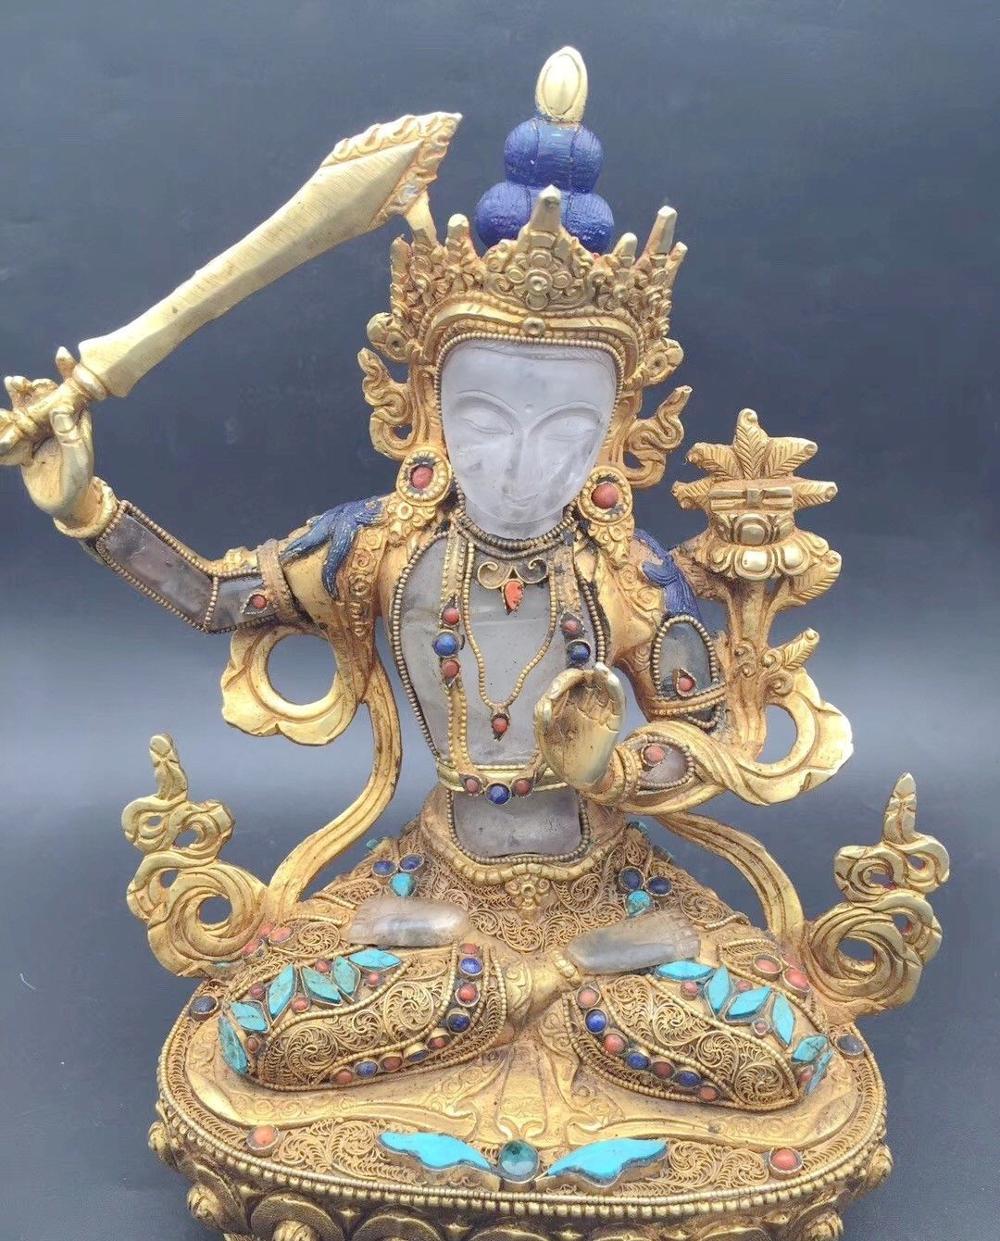 8'' Tibet Nepal Filigree Crystal Inlay Gold Gem Turquoise Hold Sword Manjusri